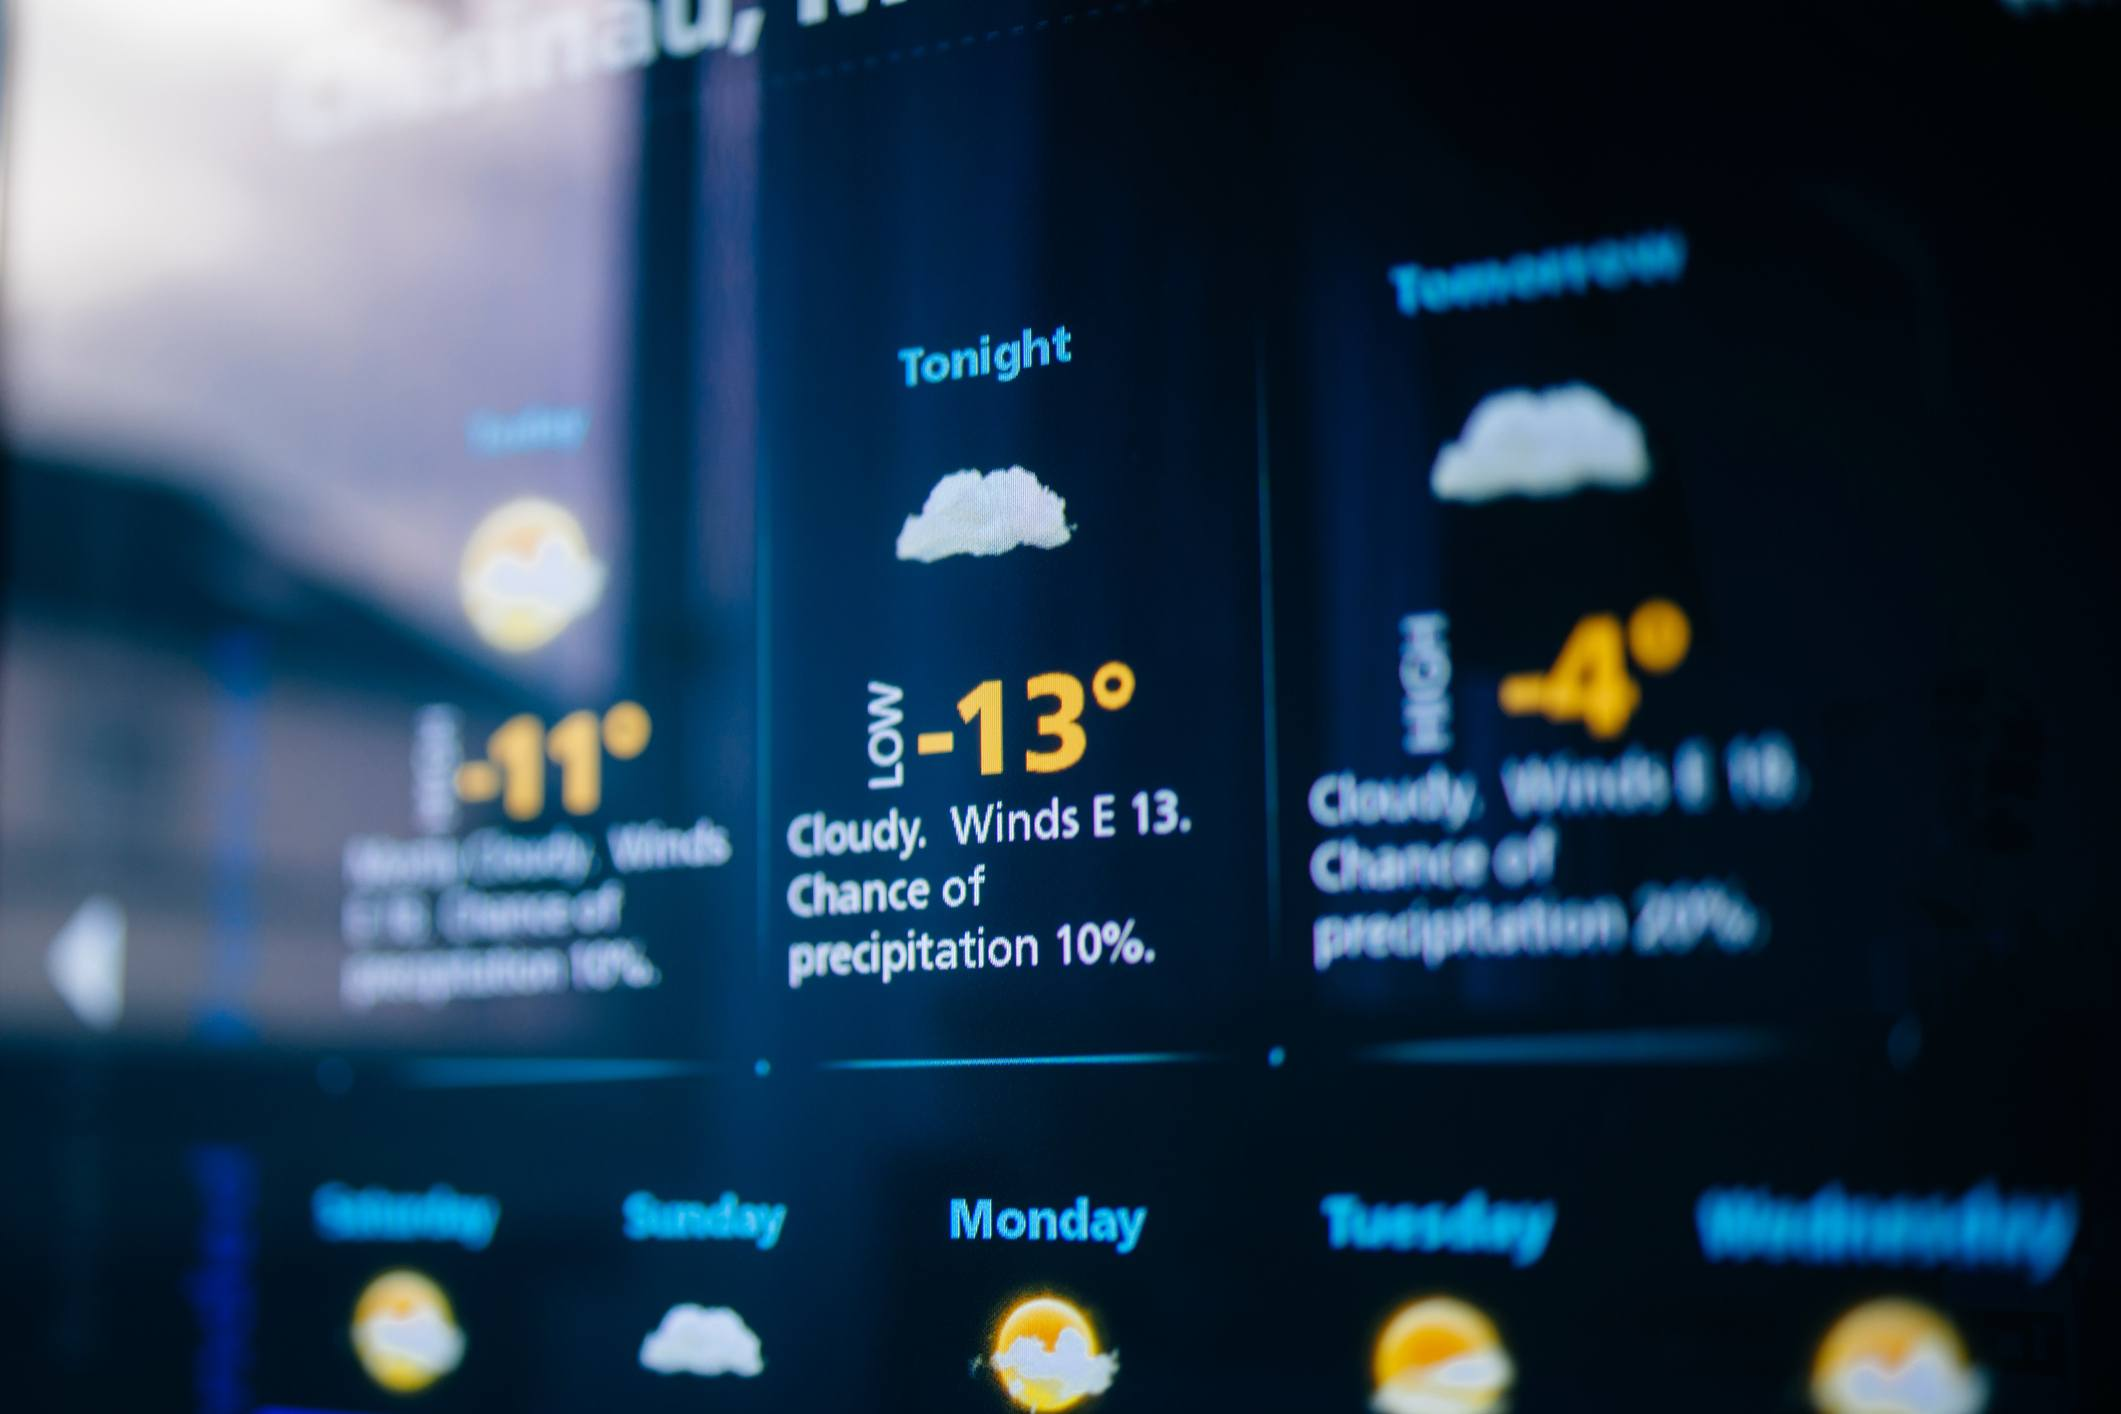 Weather forecast on a digital display